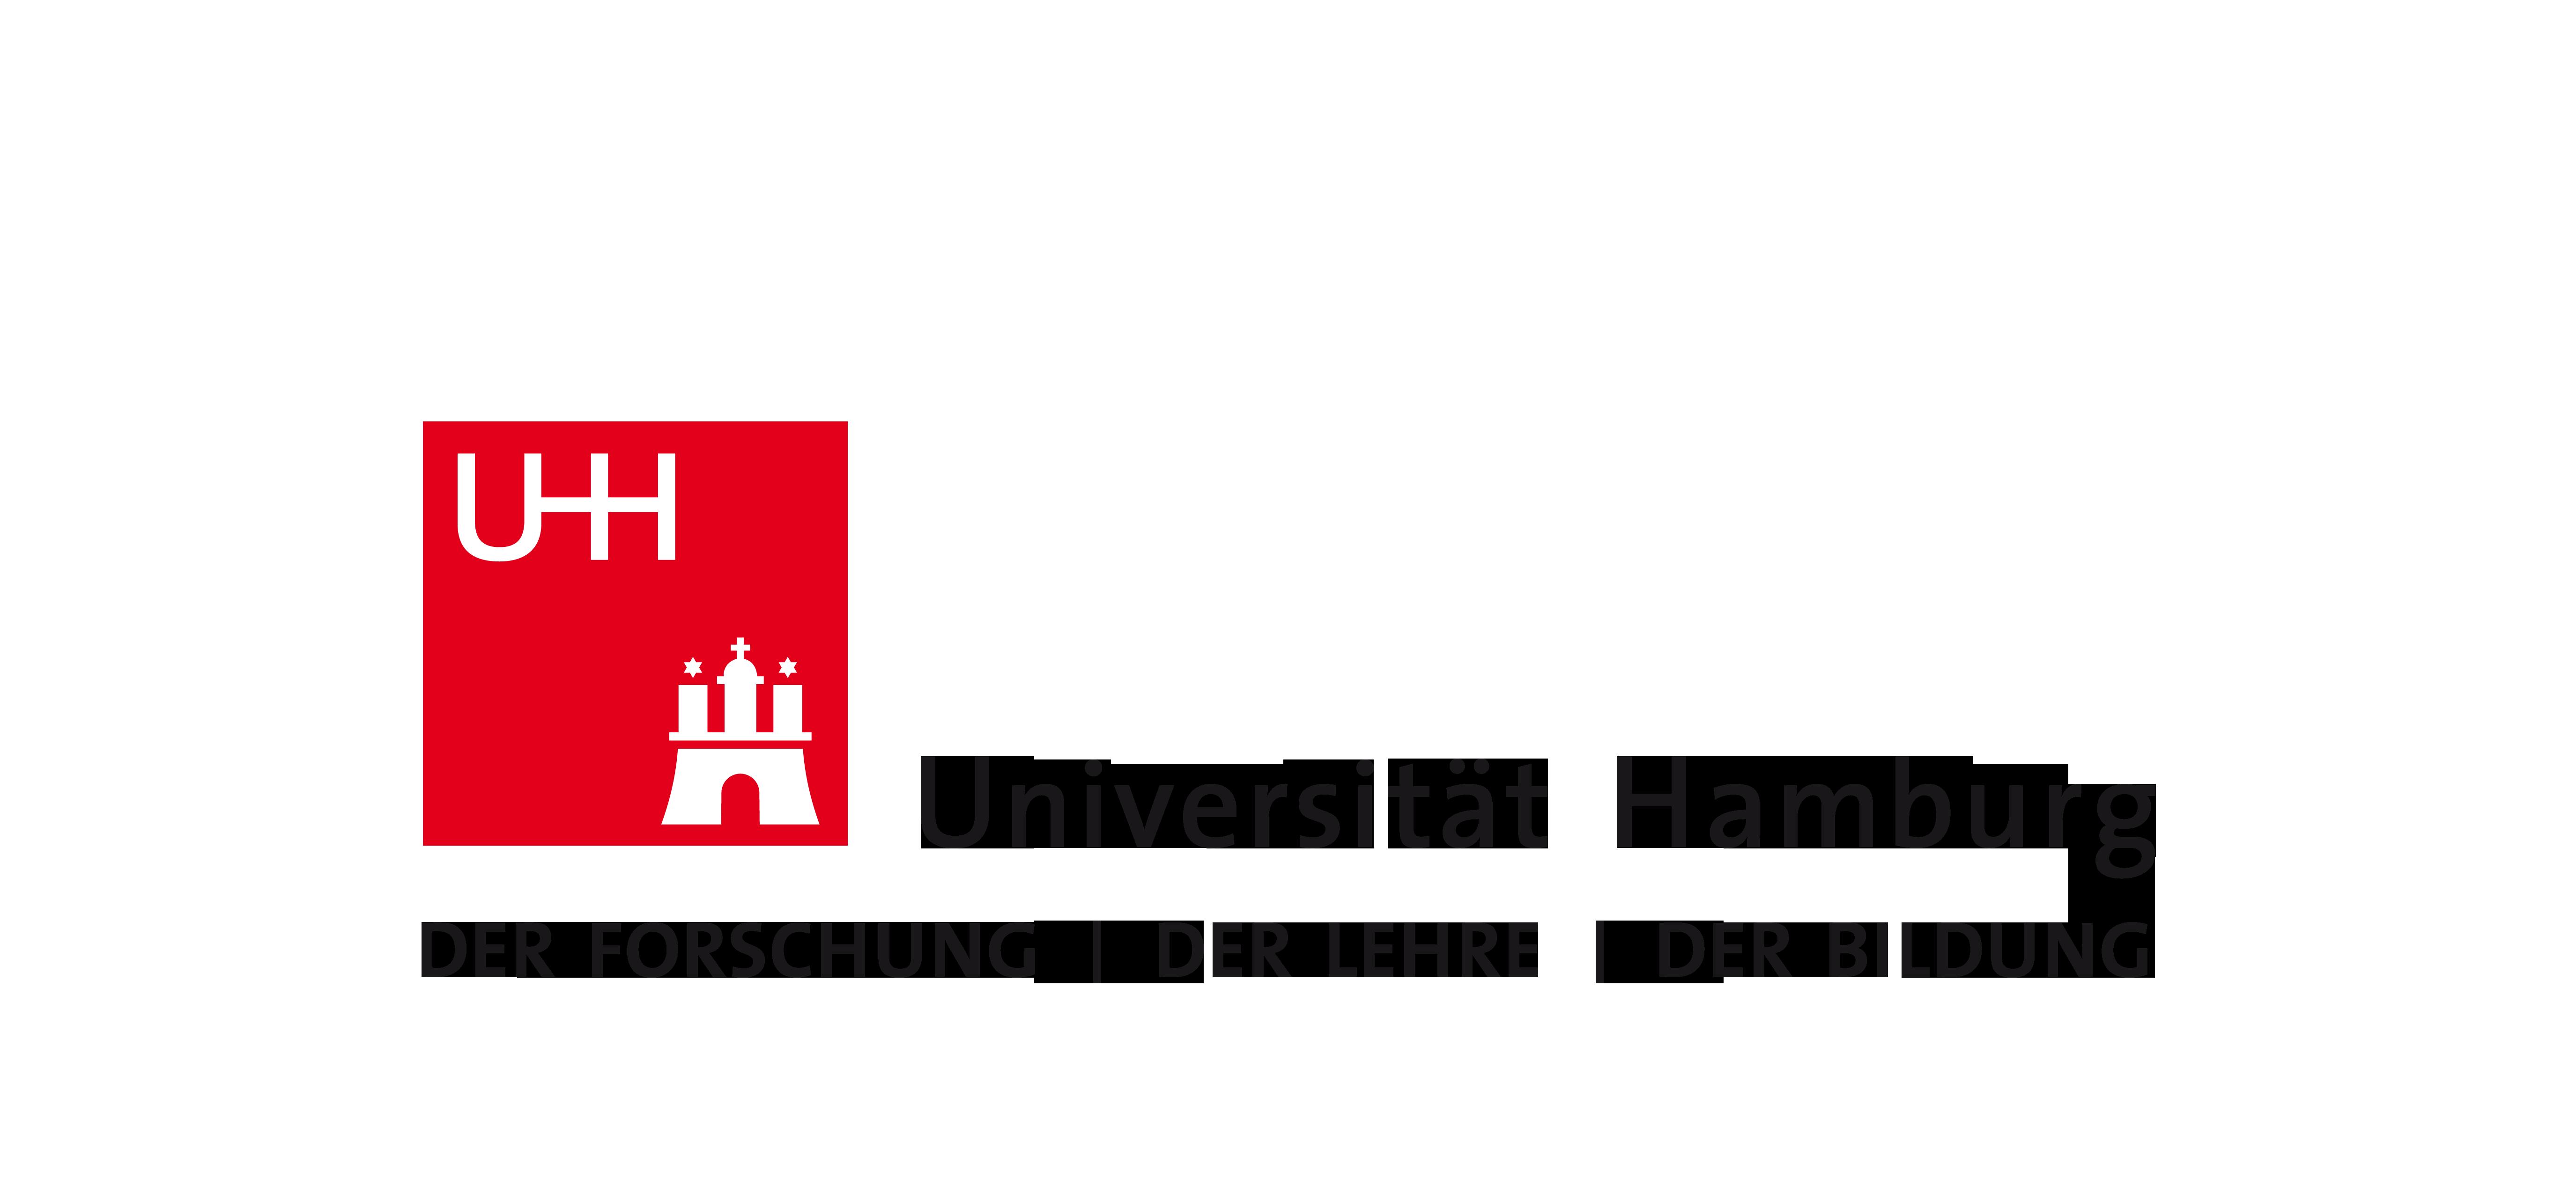 Project logos documents universit t hamburg for Hamburg universitat